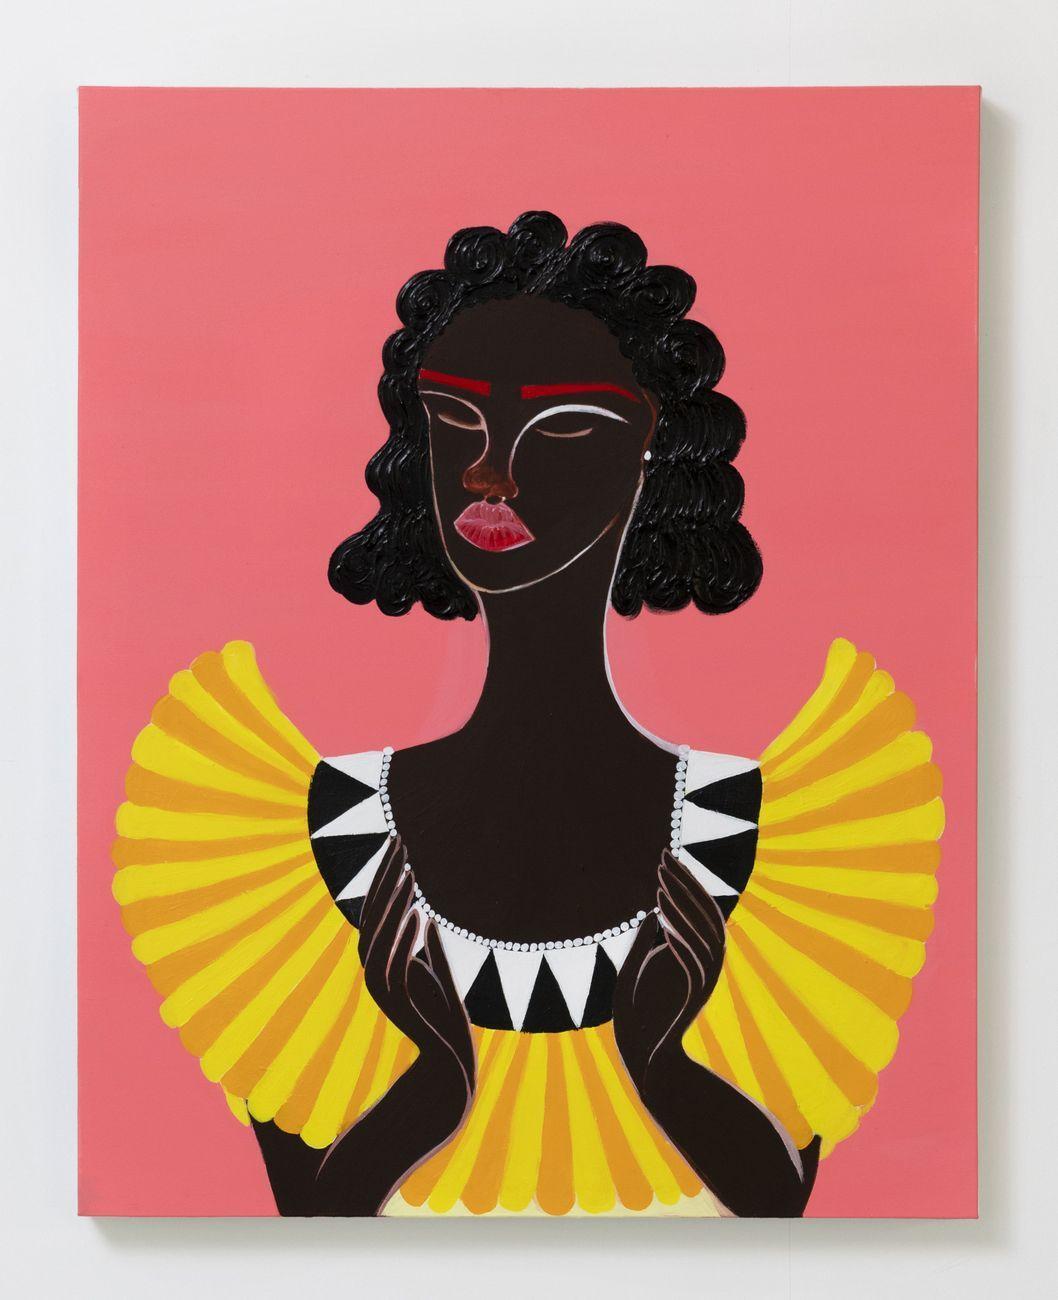 Delphine Desane, The Medium is the Message, 2021, acrylic on canvas, 76.2x60.9 cm. Courtesy the artist and Luce Gallery, Torino. Photo Andrea Ferrari